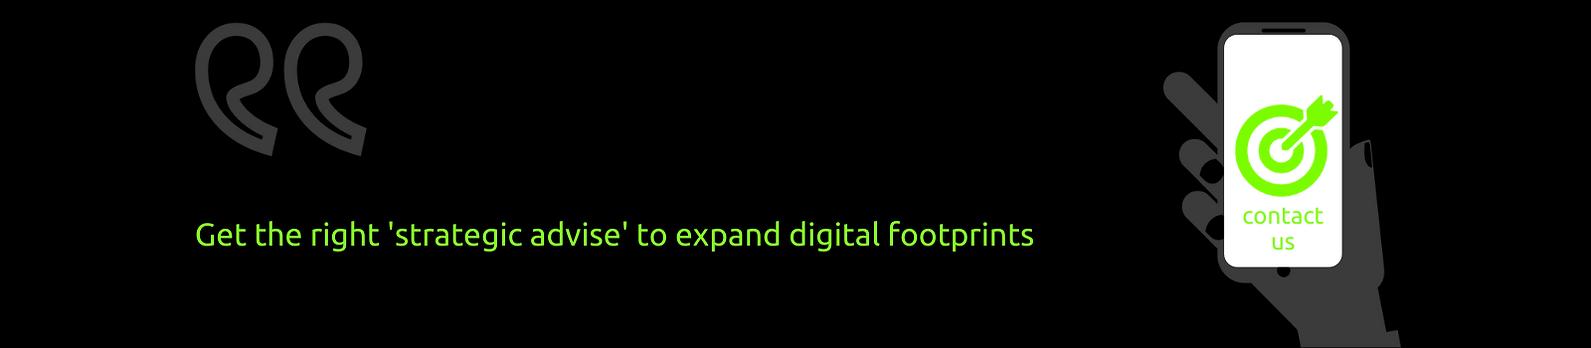 Digital Marketing Contact